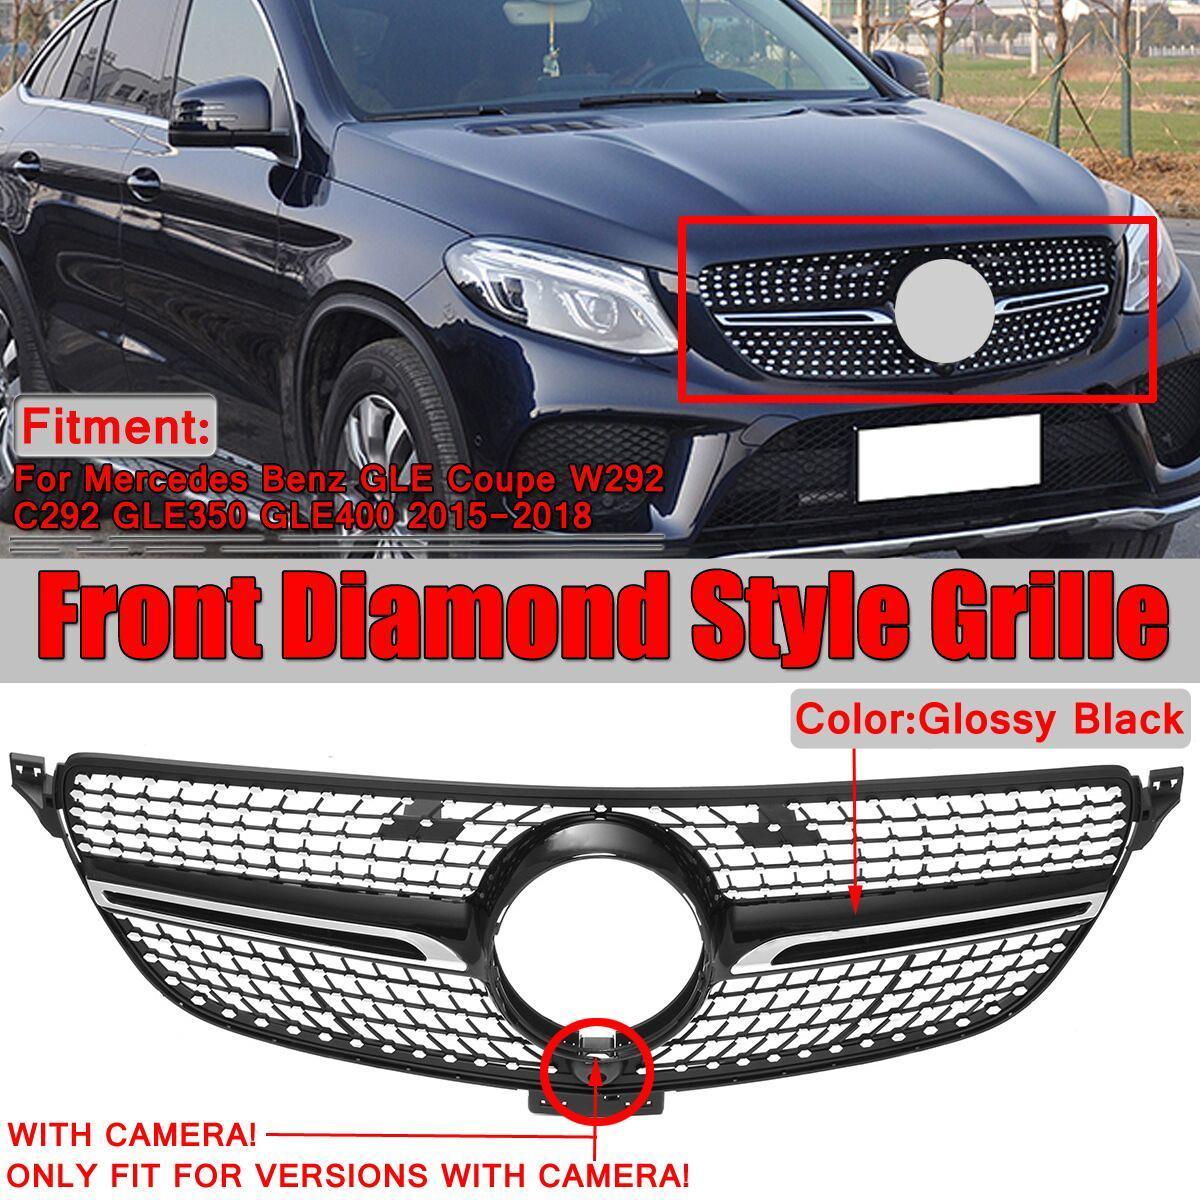 Black Diamond Storm Headlamp Manual Pdf